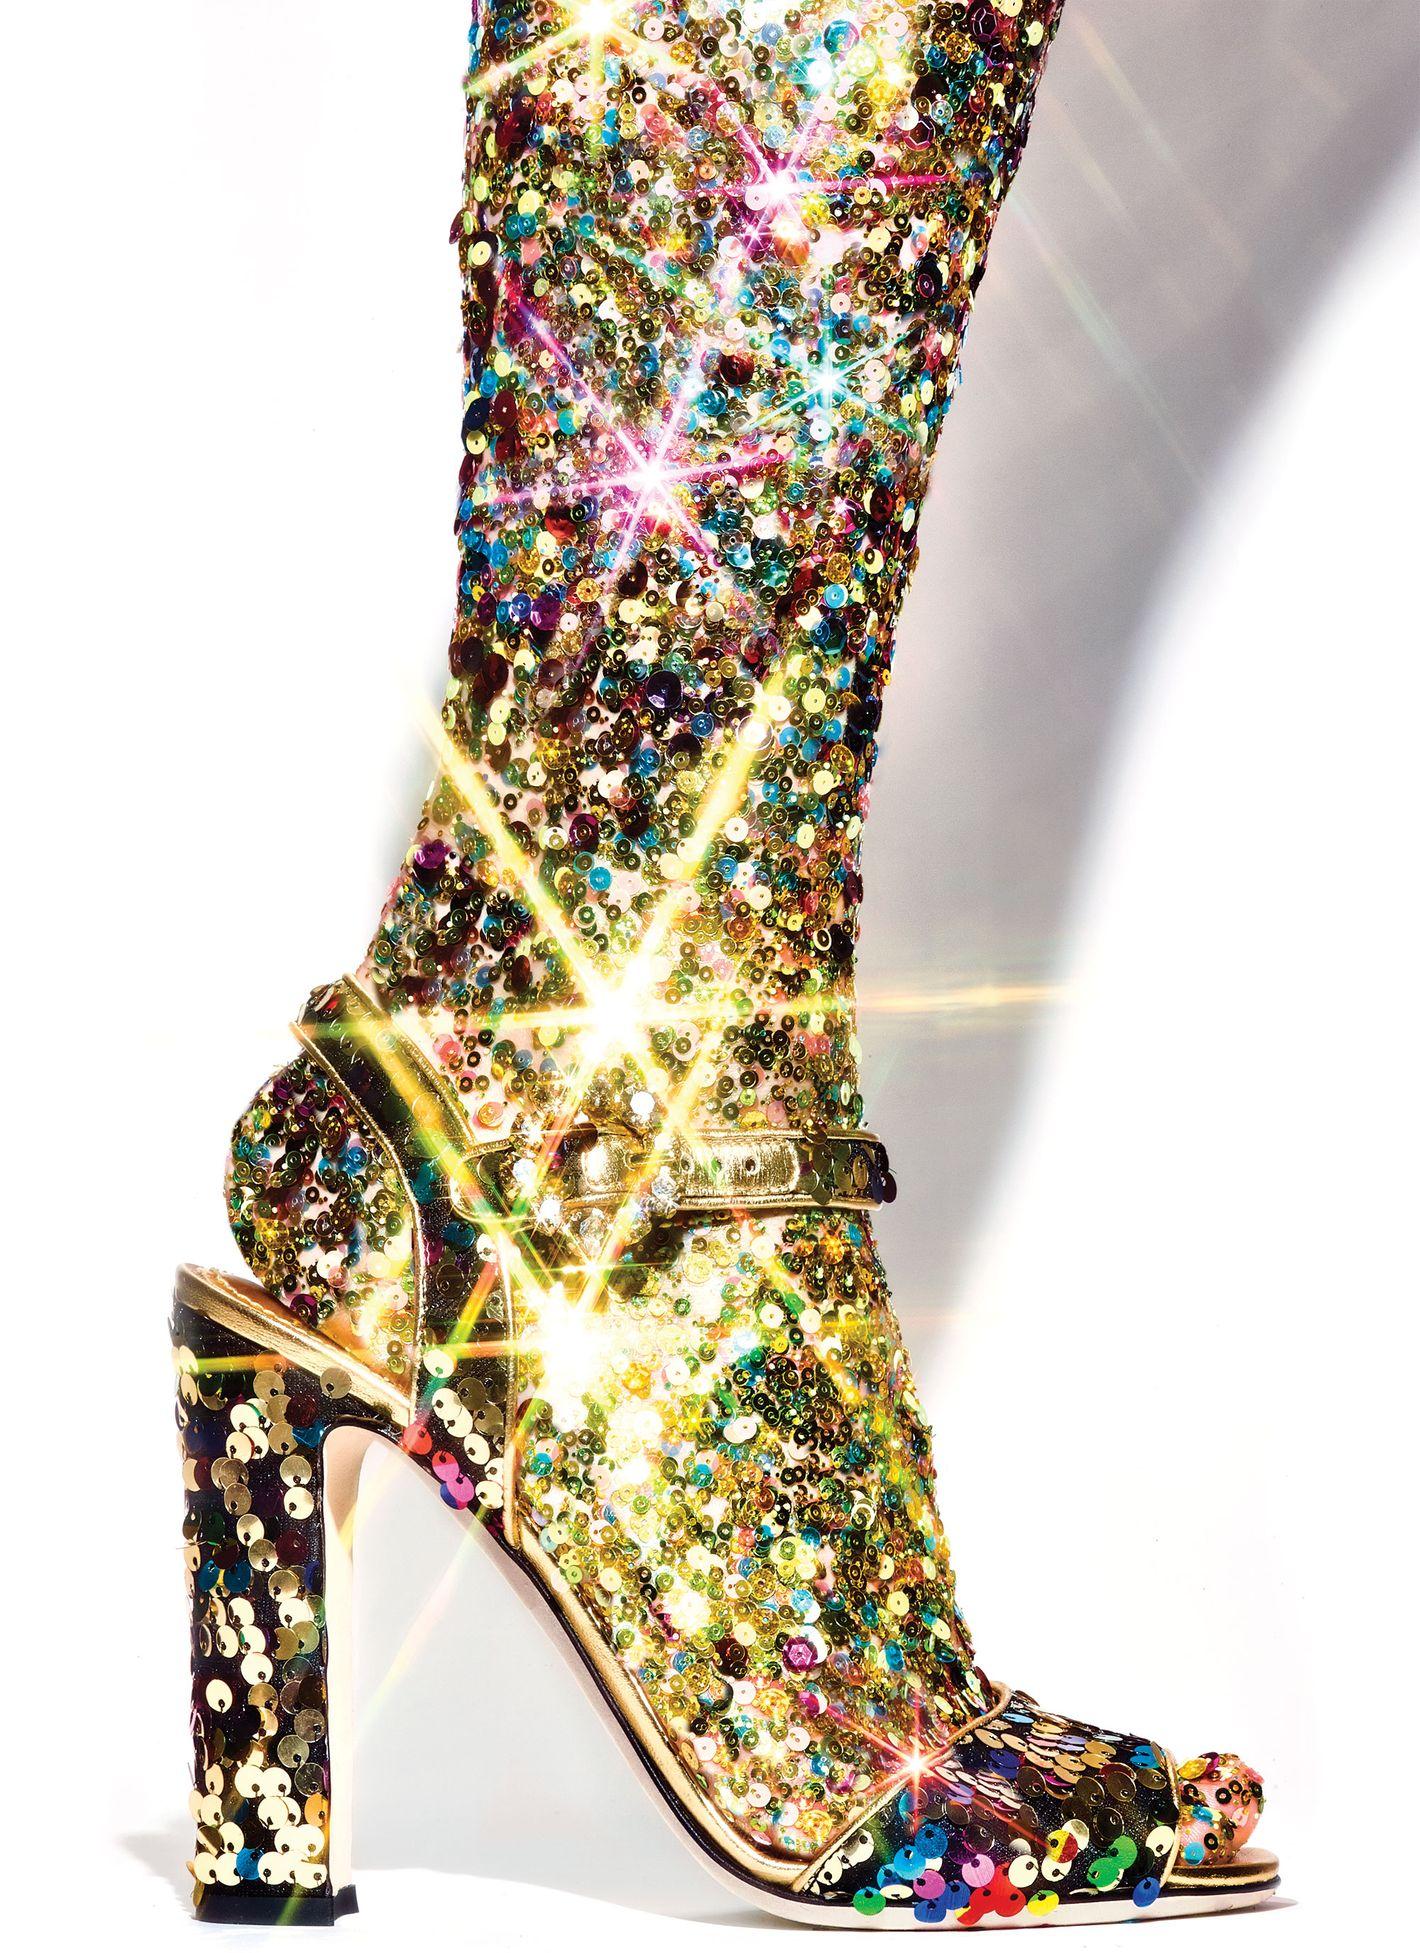 Dolce & Gabbana Sequin Sandal